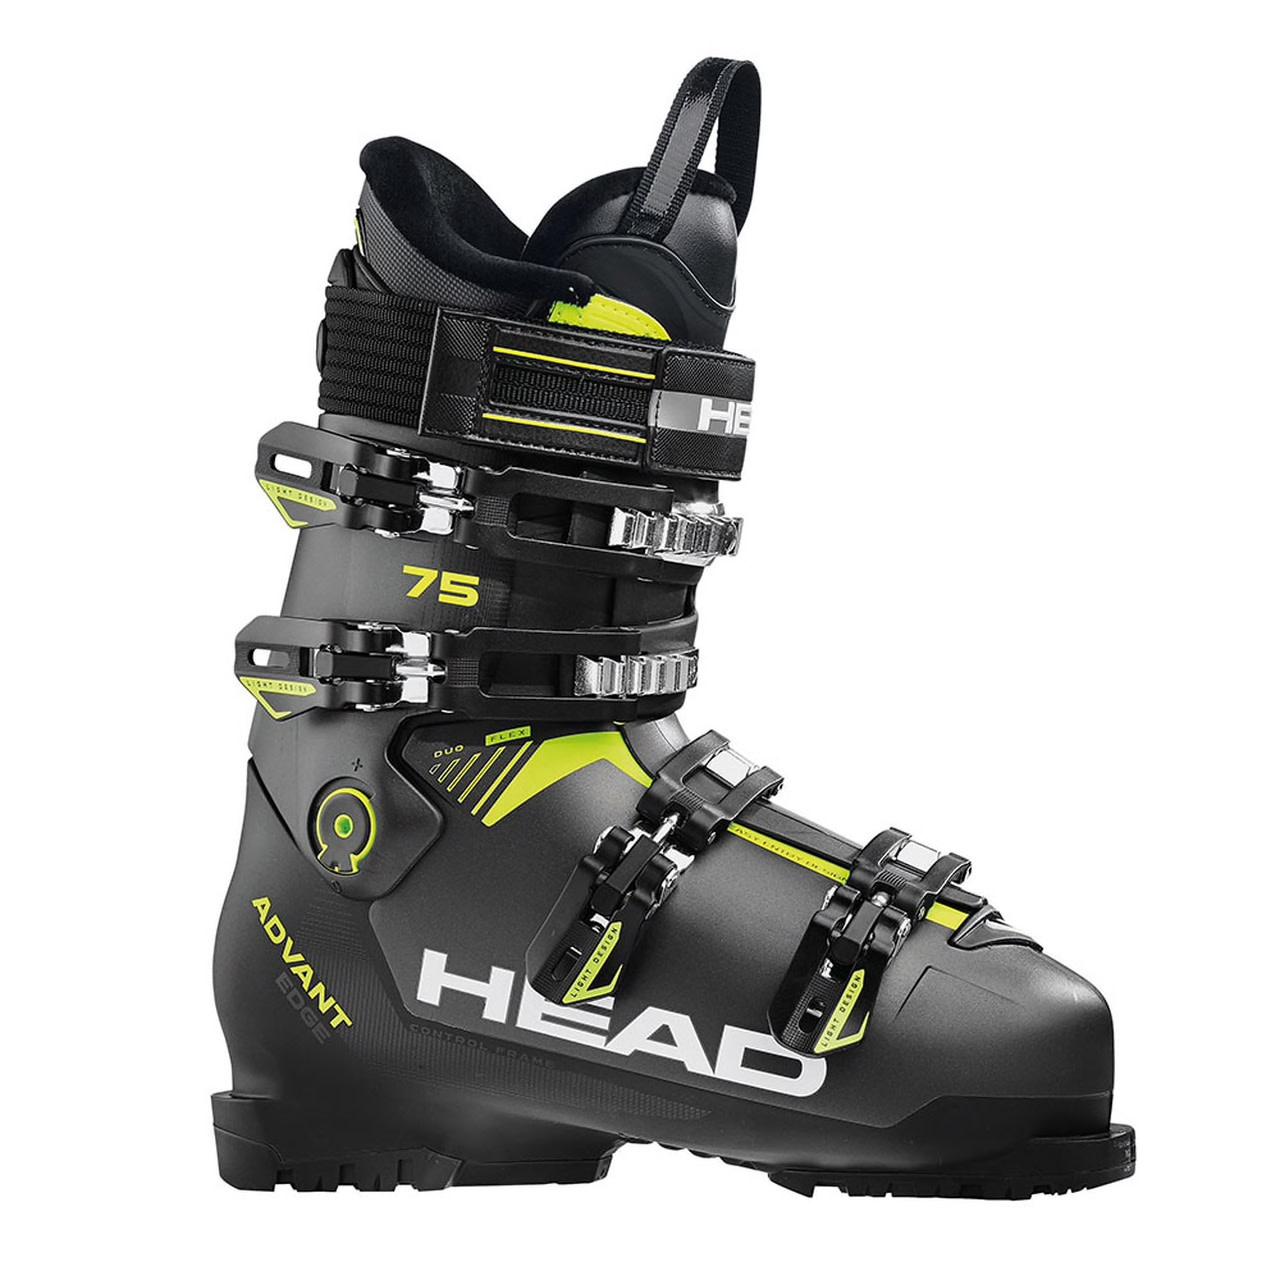 Head Head M's Advant Edge 75 Ski Boot